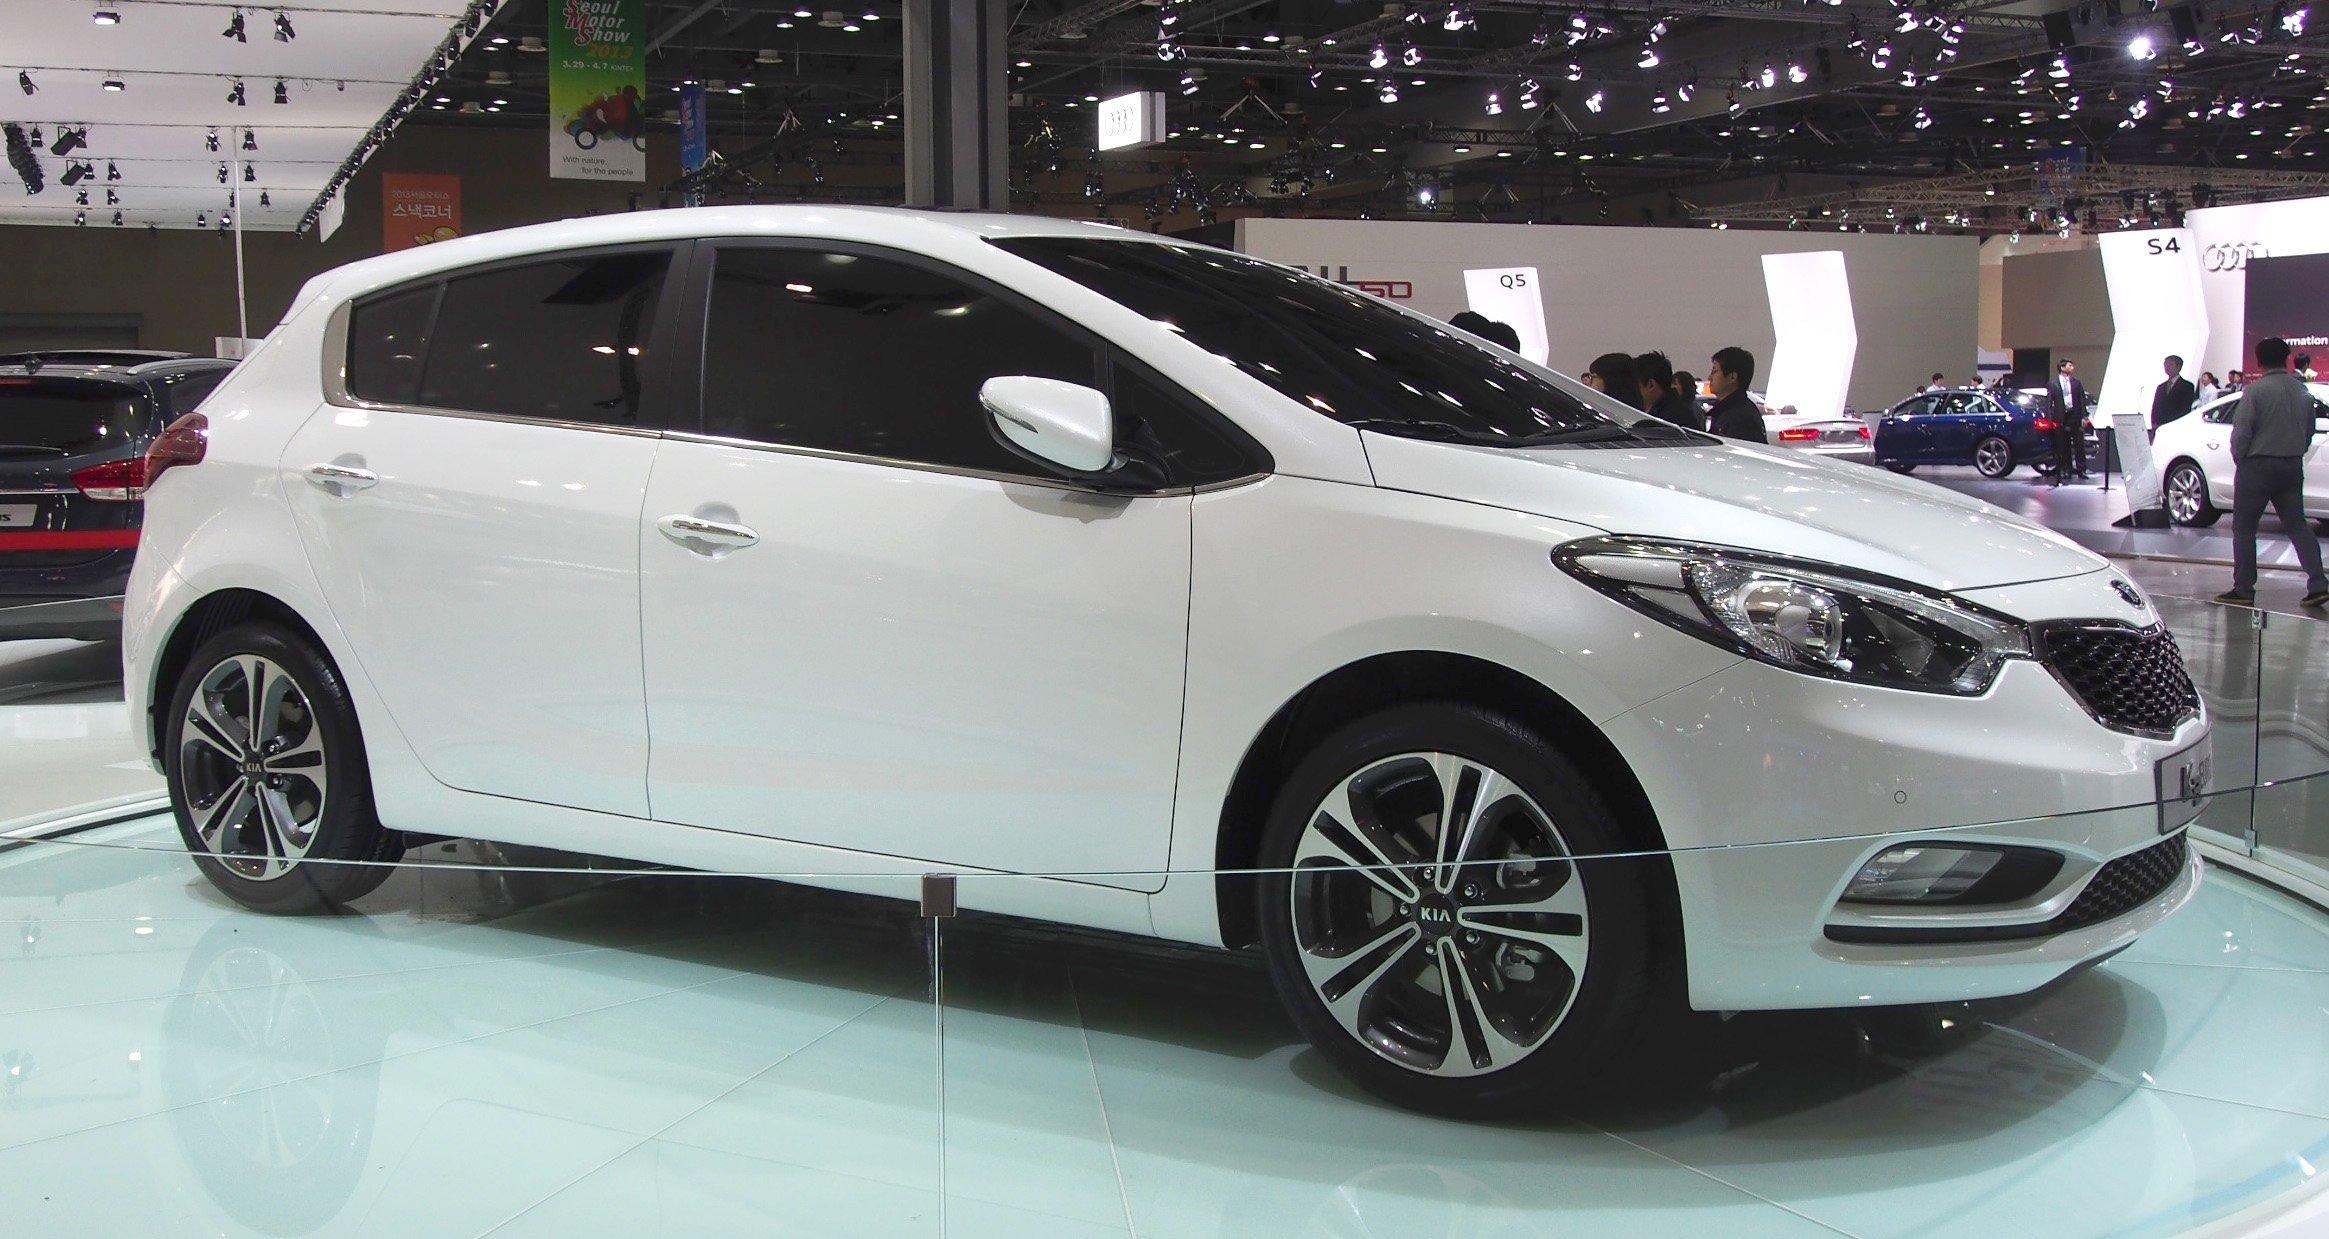 Kia Forte hatchback is called the K3 Euro in Korea Paul